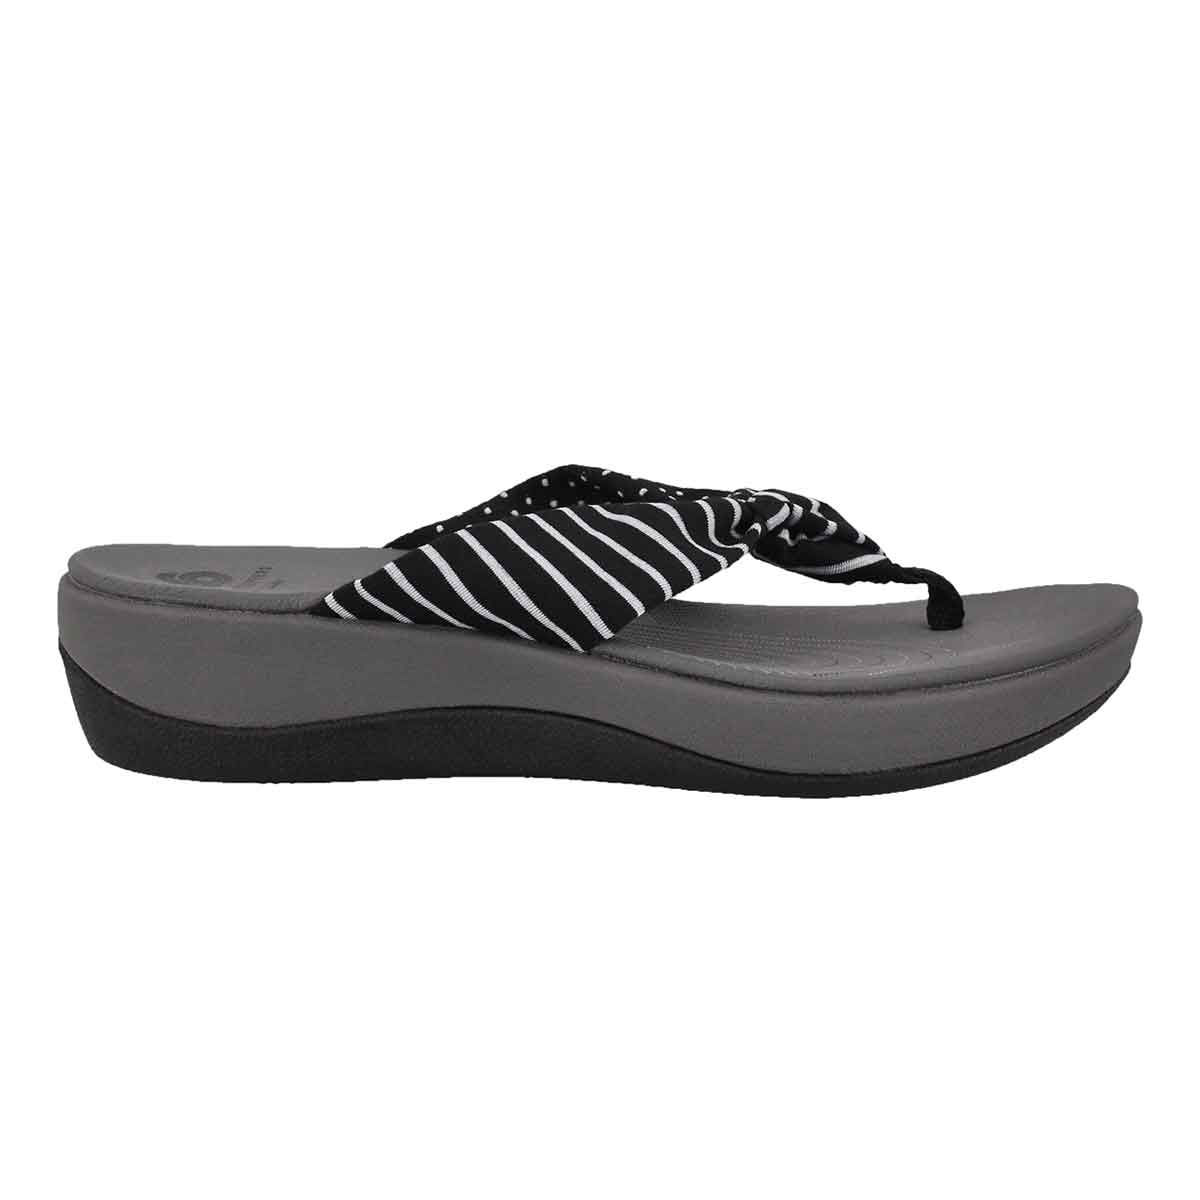 Lds Arla Glison blk prnt wedge sandal